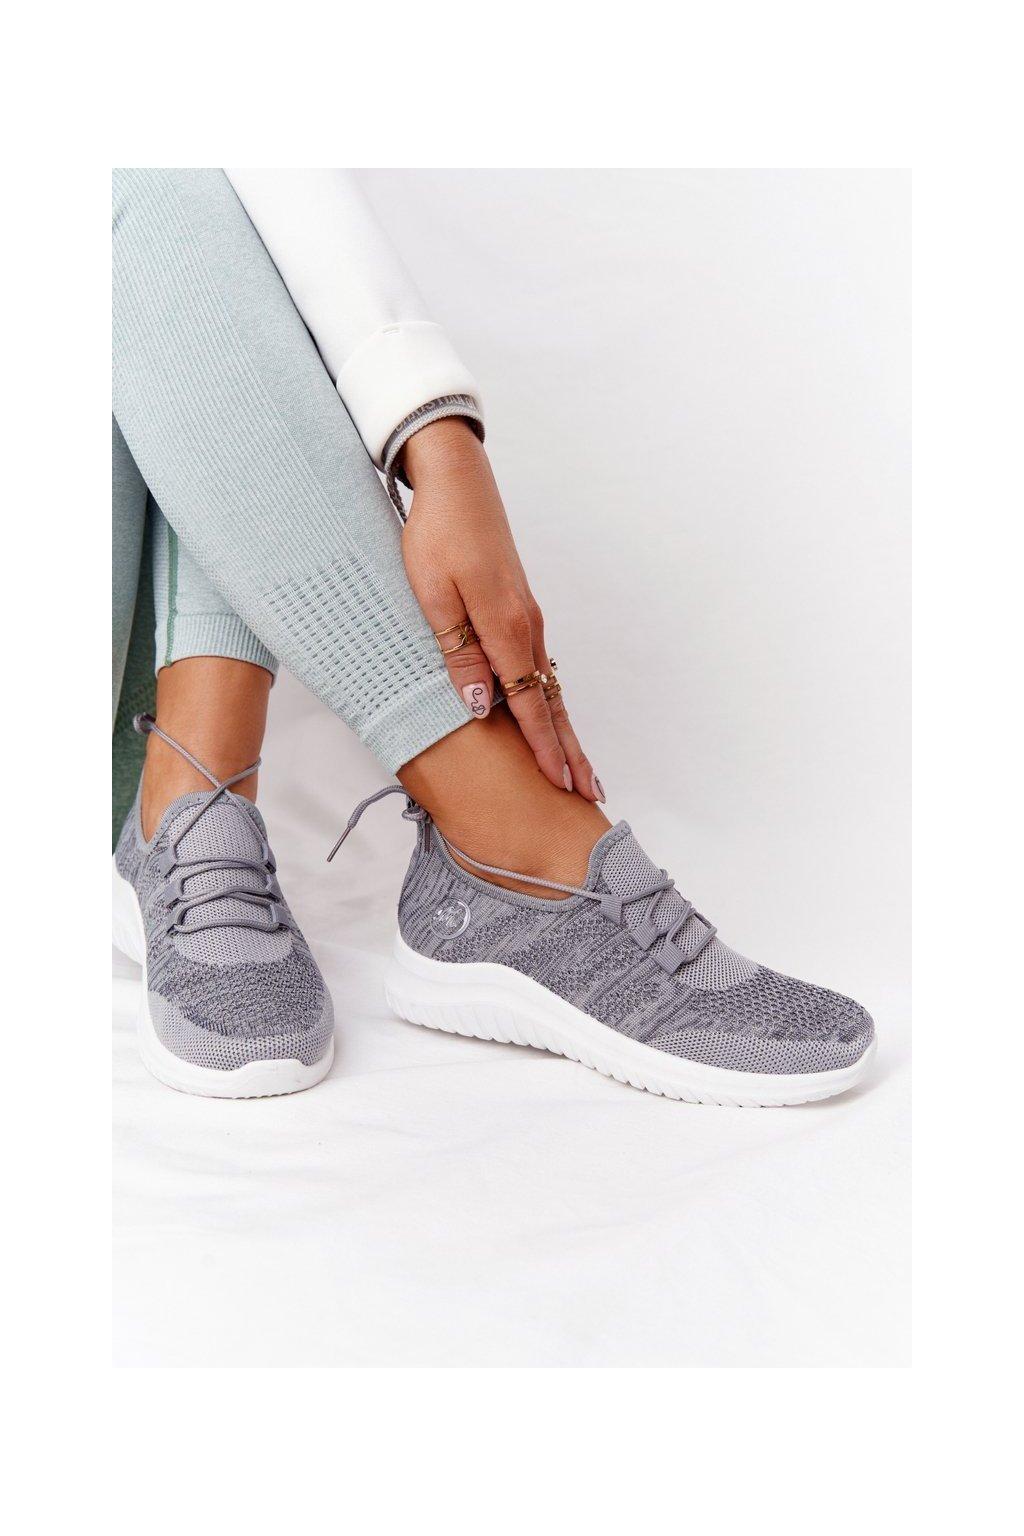 Dámske tenisky farba sivá kód obuvi YM001-3 GREY